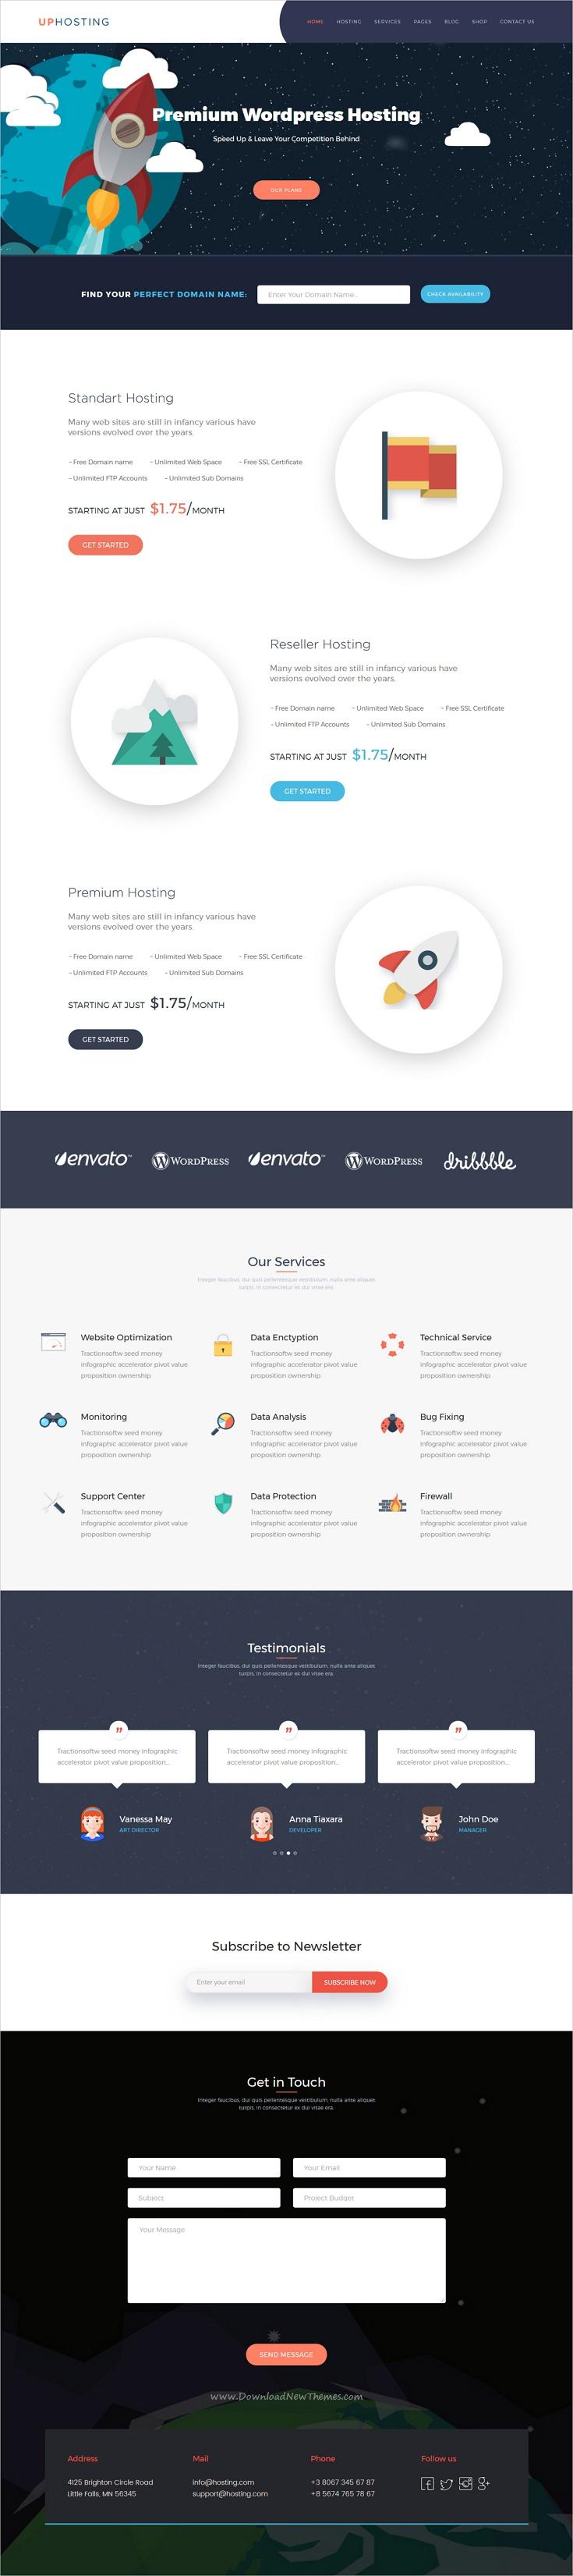 Pin von Web Design Inspiration auf Free Bootstrap Themes Collection ...